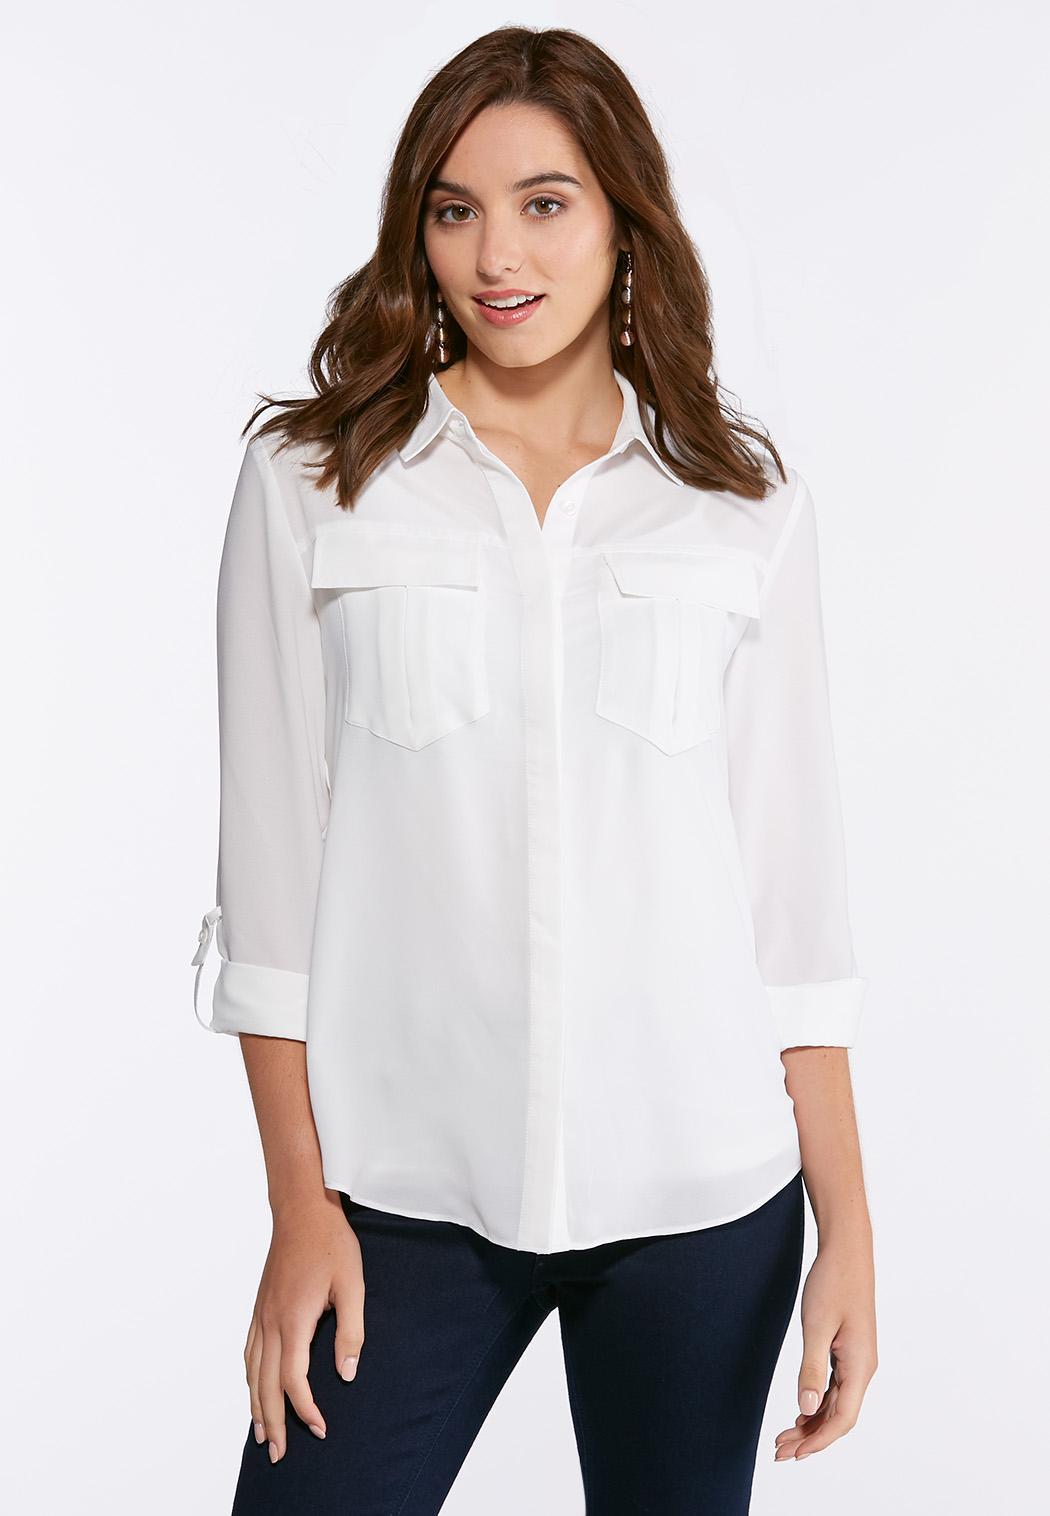 c6579bb49d7fd Button Down Boyfriend Shirt Shirts   Blouses Cato Fashions